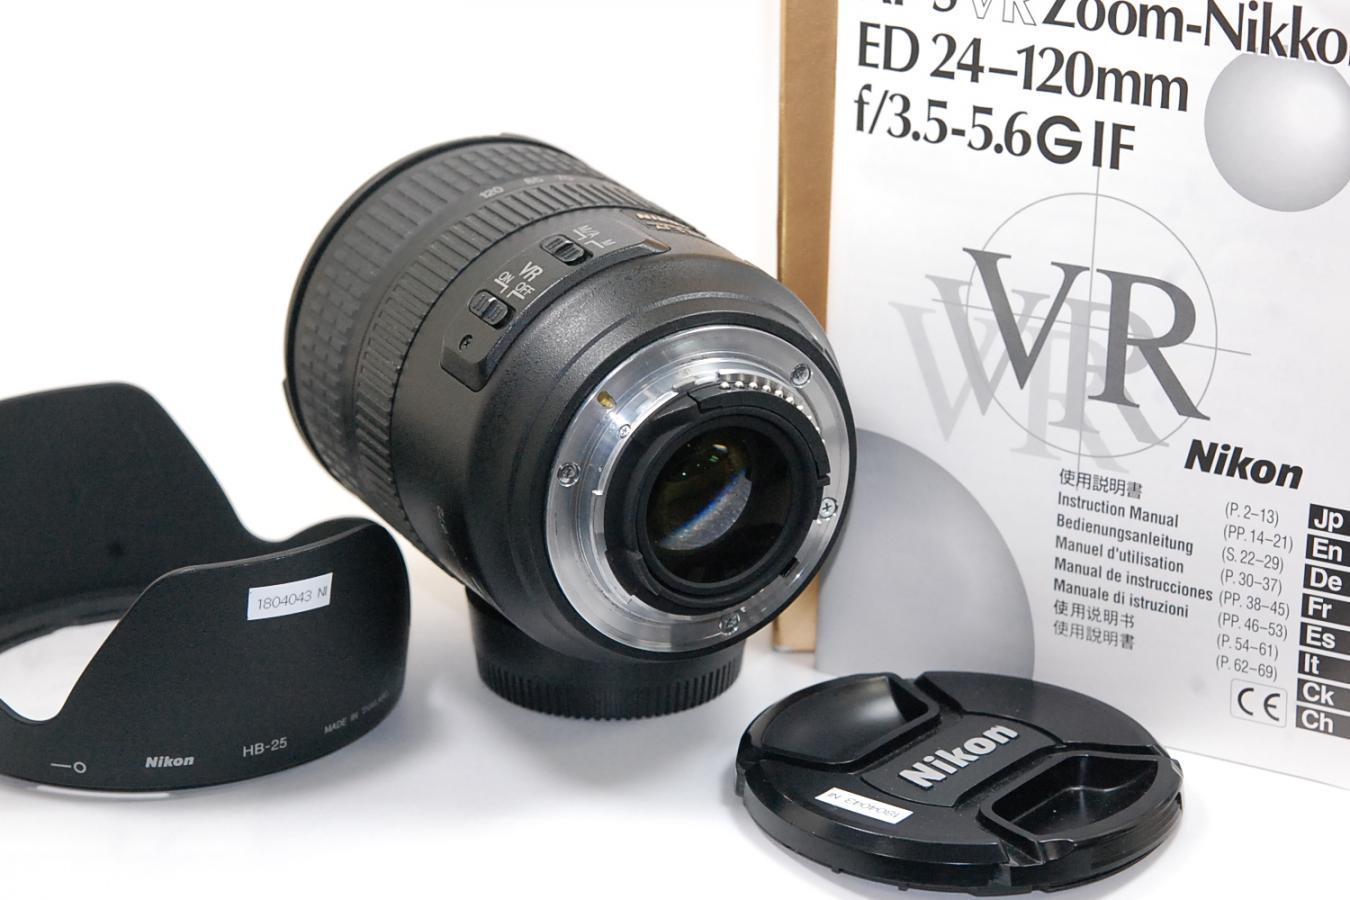 AF-S NIKKOR 24-120mm F3.5-5.6G VR ED 【純正フードHB-25、元箱付】